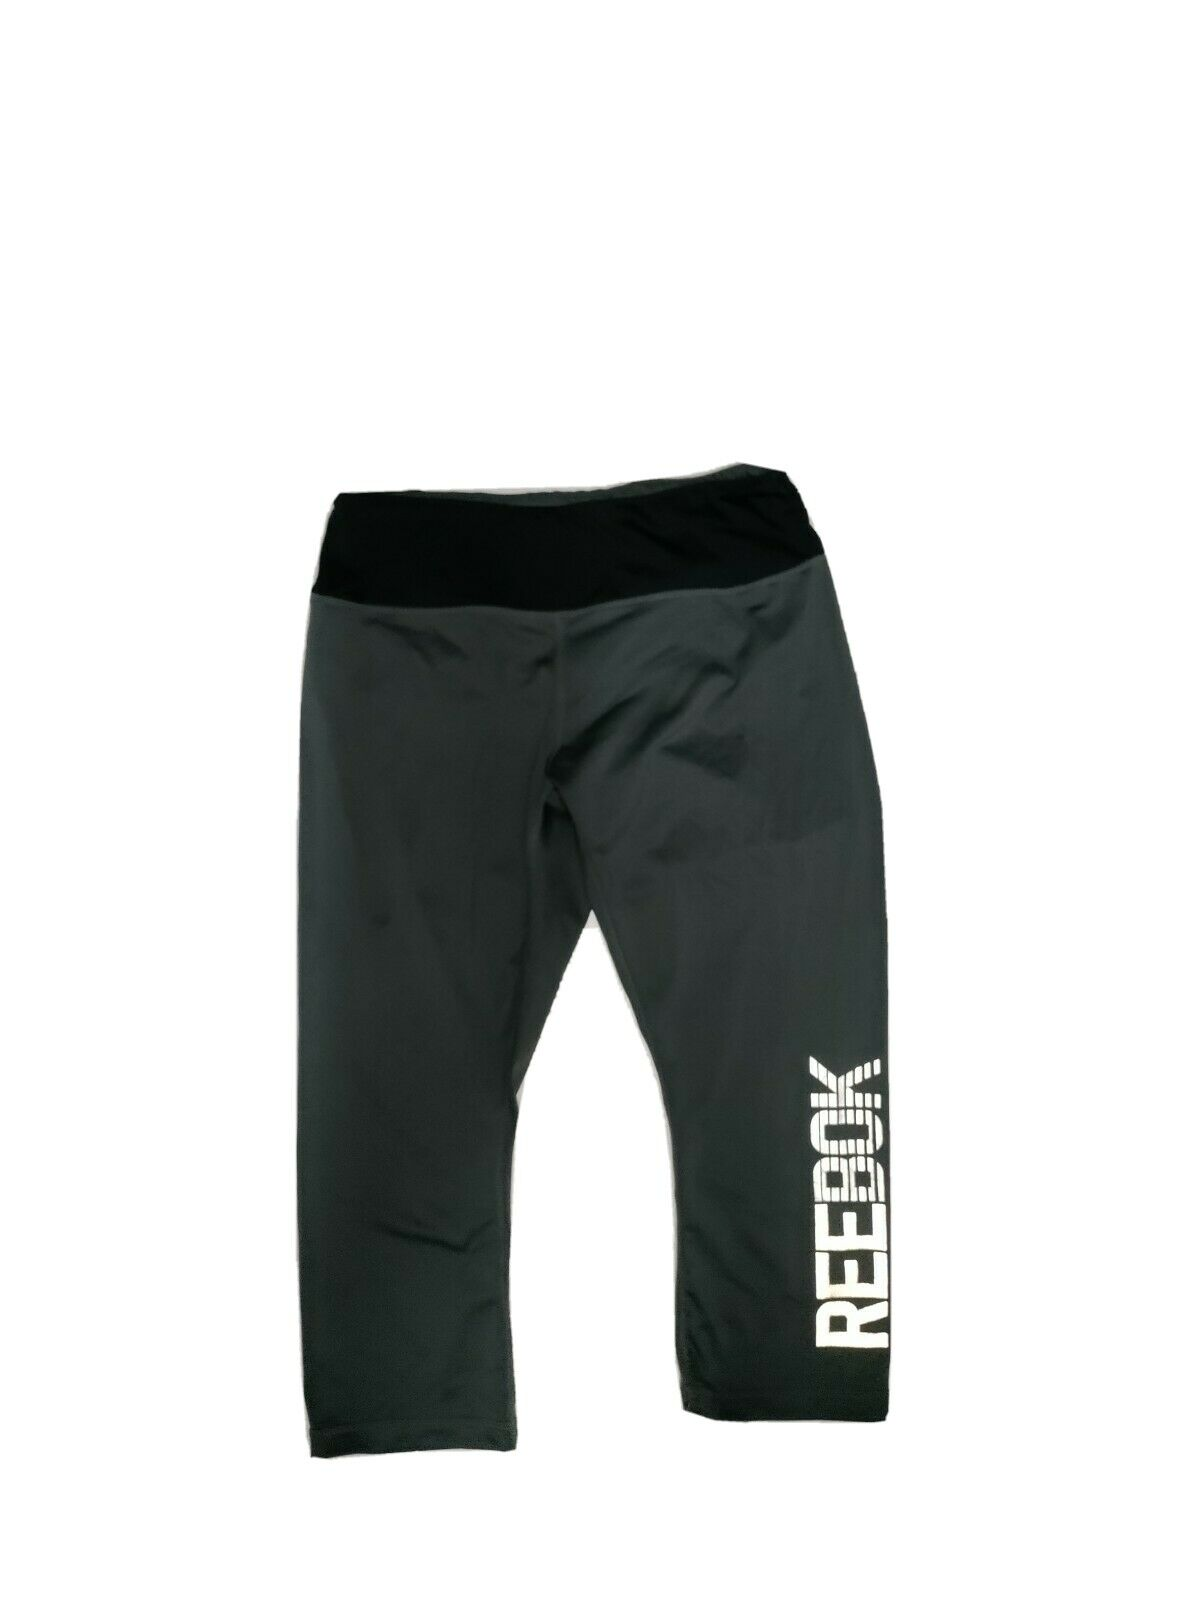 Reebok Womens M Athletic Reflective Big Logo Poly Spandex Capri Stretch Leggings